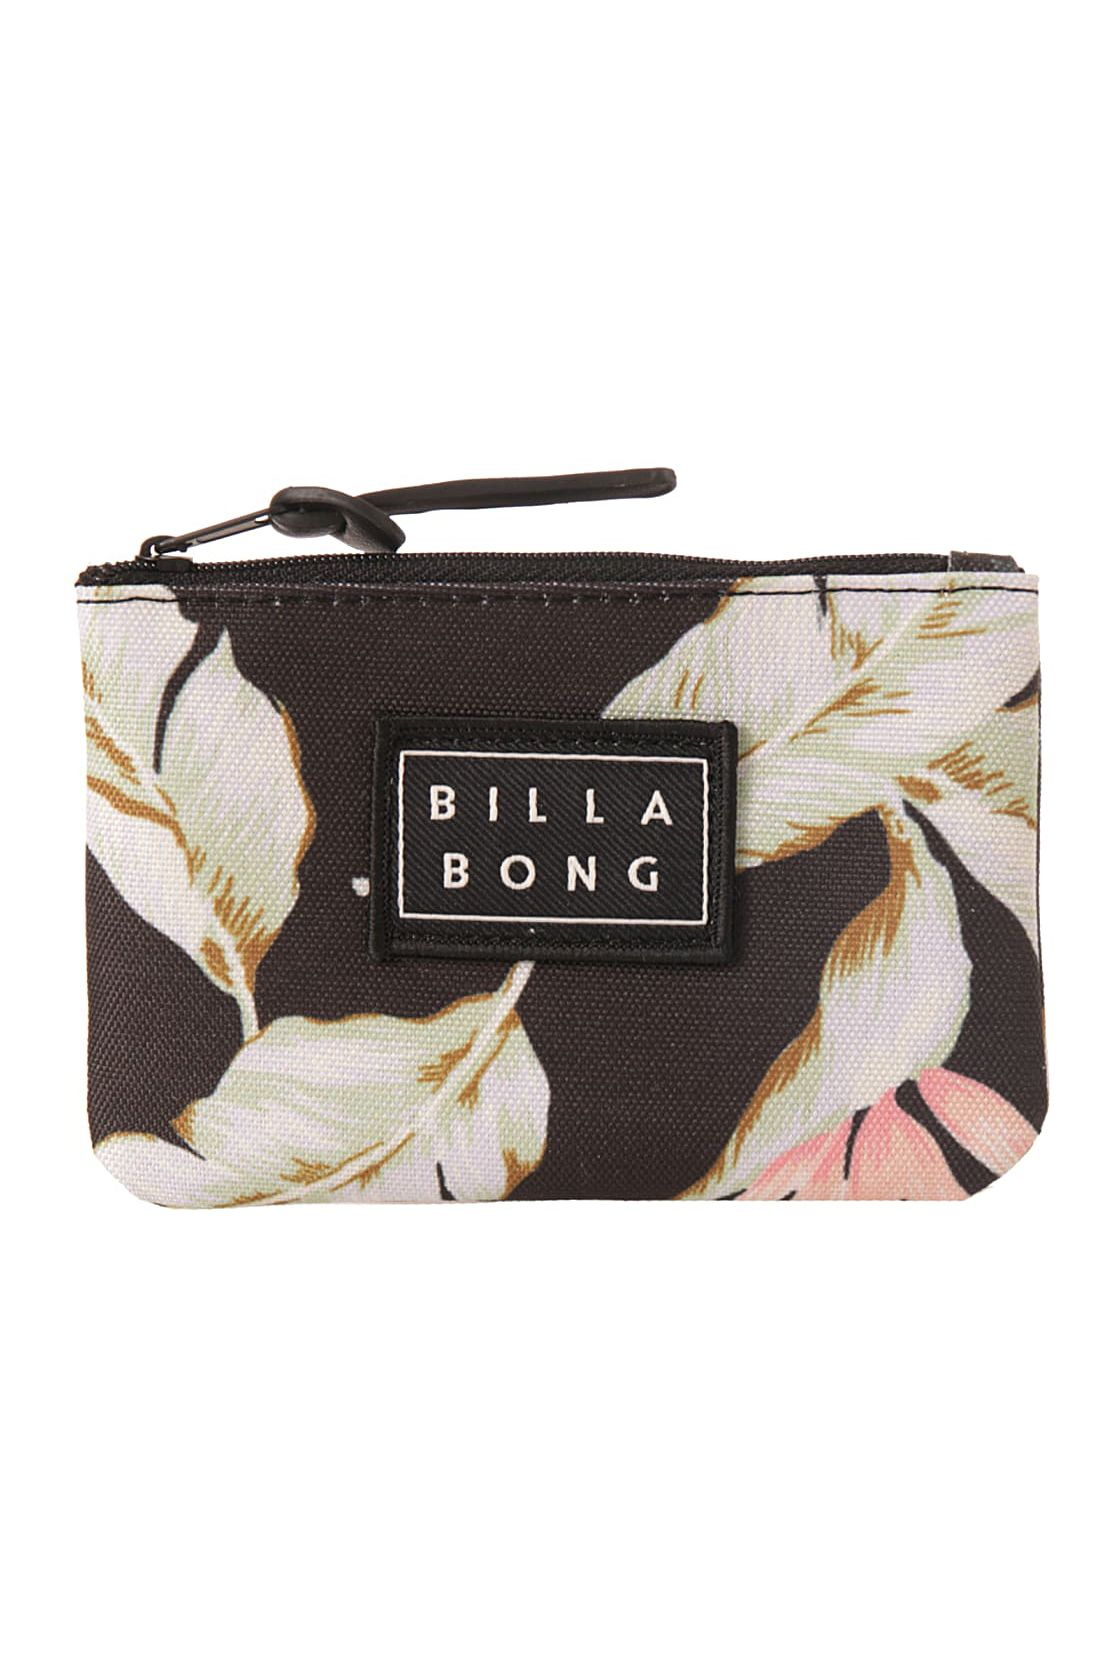 Carteira Billabong TINY CASE Black/Mint